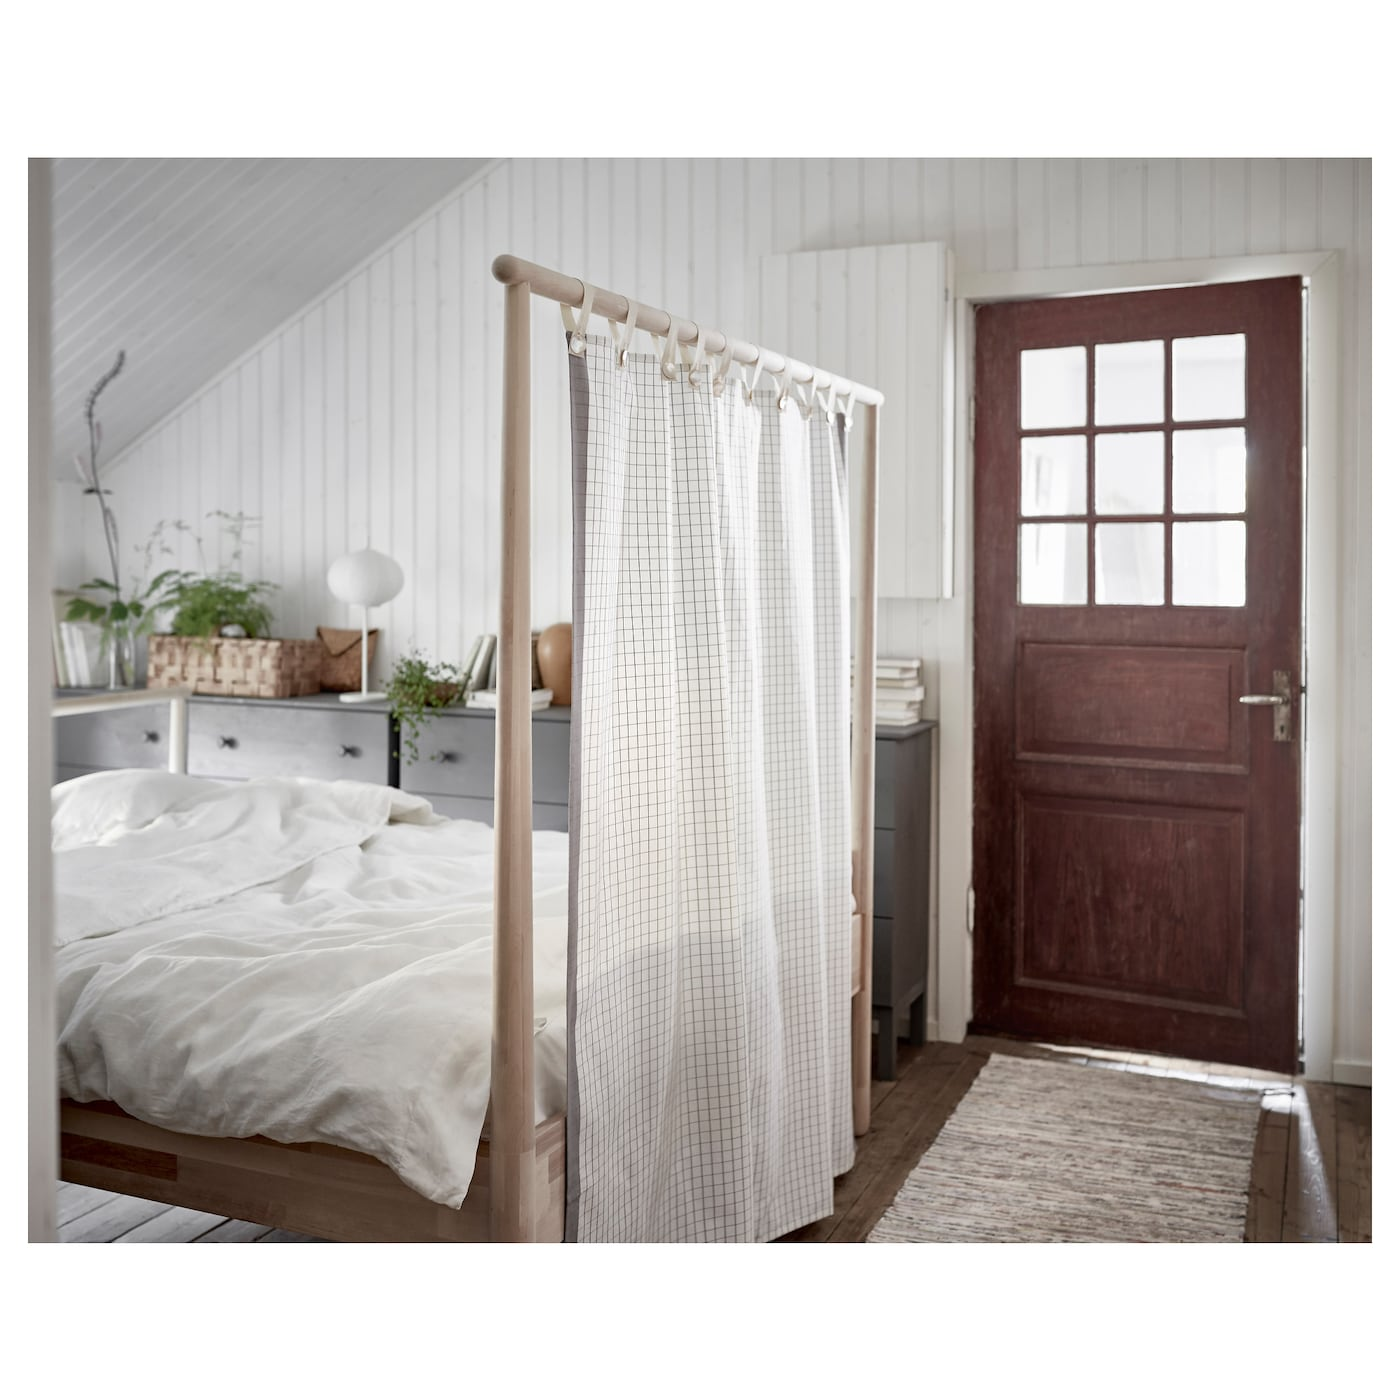 gj ra cadre de lit bouleau 160x200 cm ikea. Black Bedroom Furniture Sets. Home Design Ideas